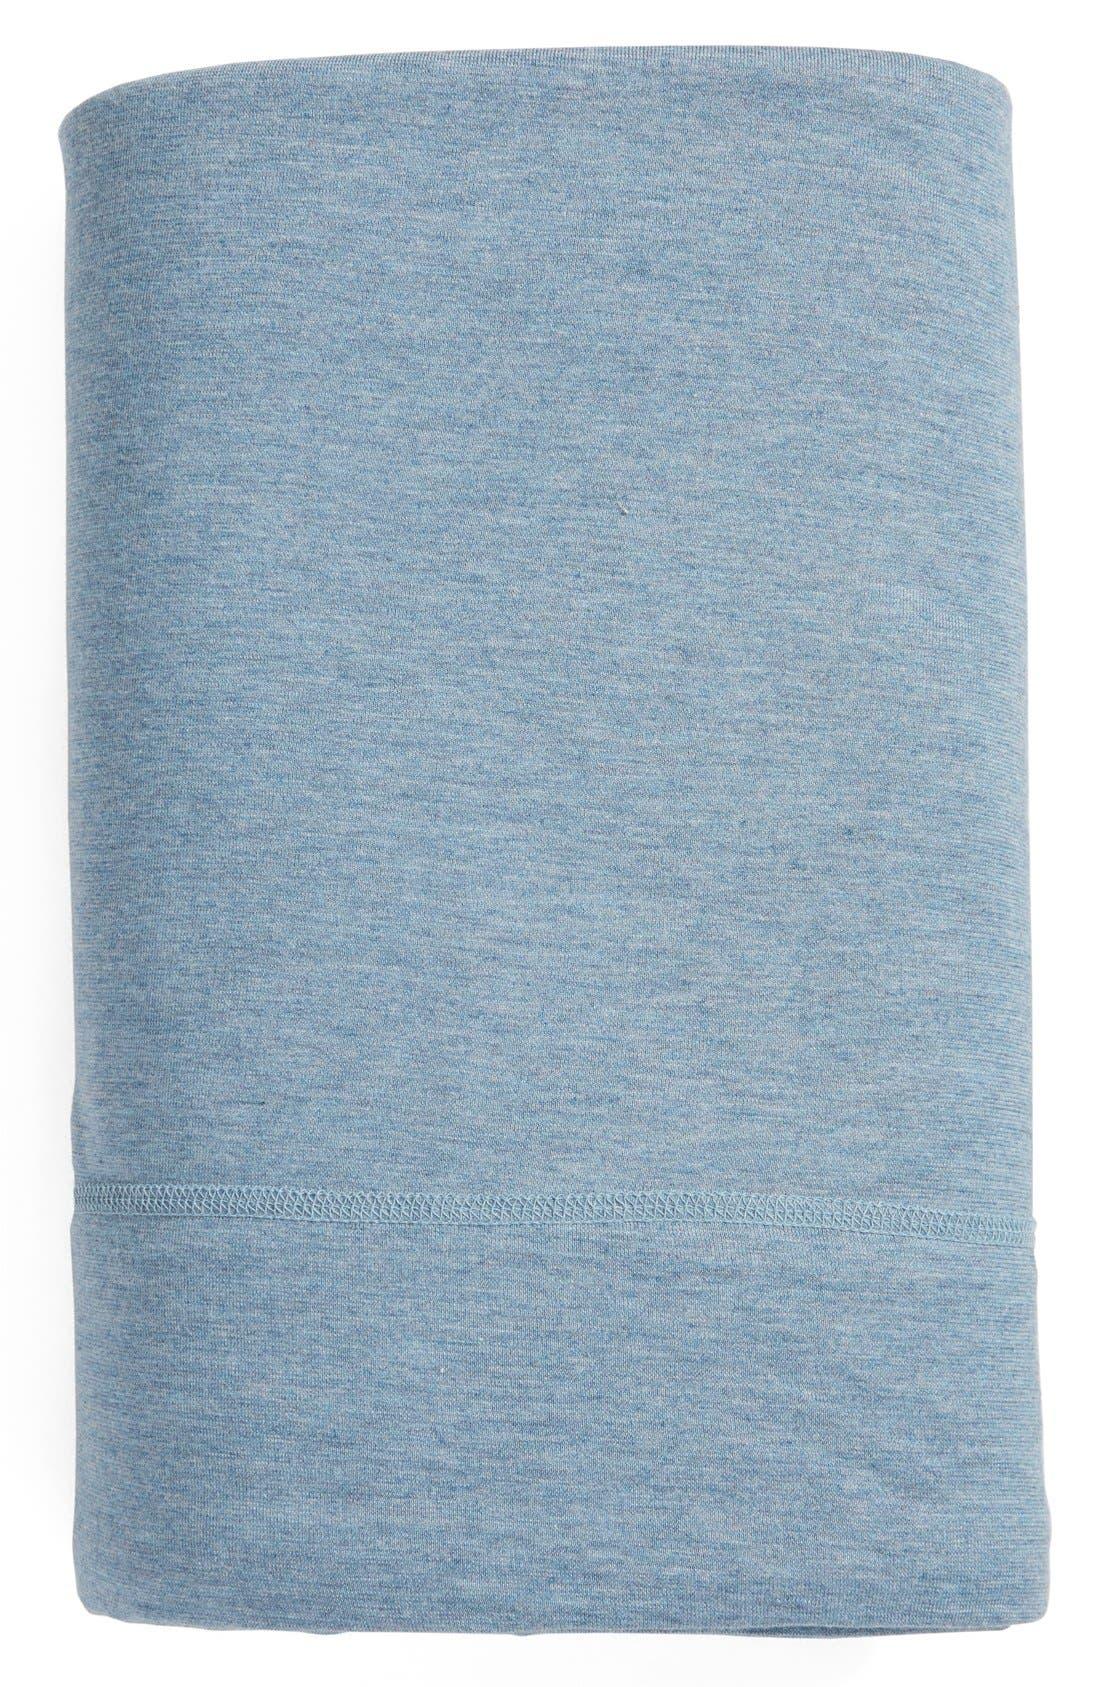 Alternate Image 1 Selected - Calvin Klein Modern Cotton Collection Cotton & Modal Flat Sheet